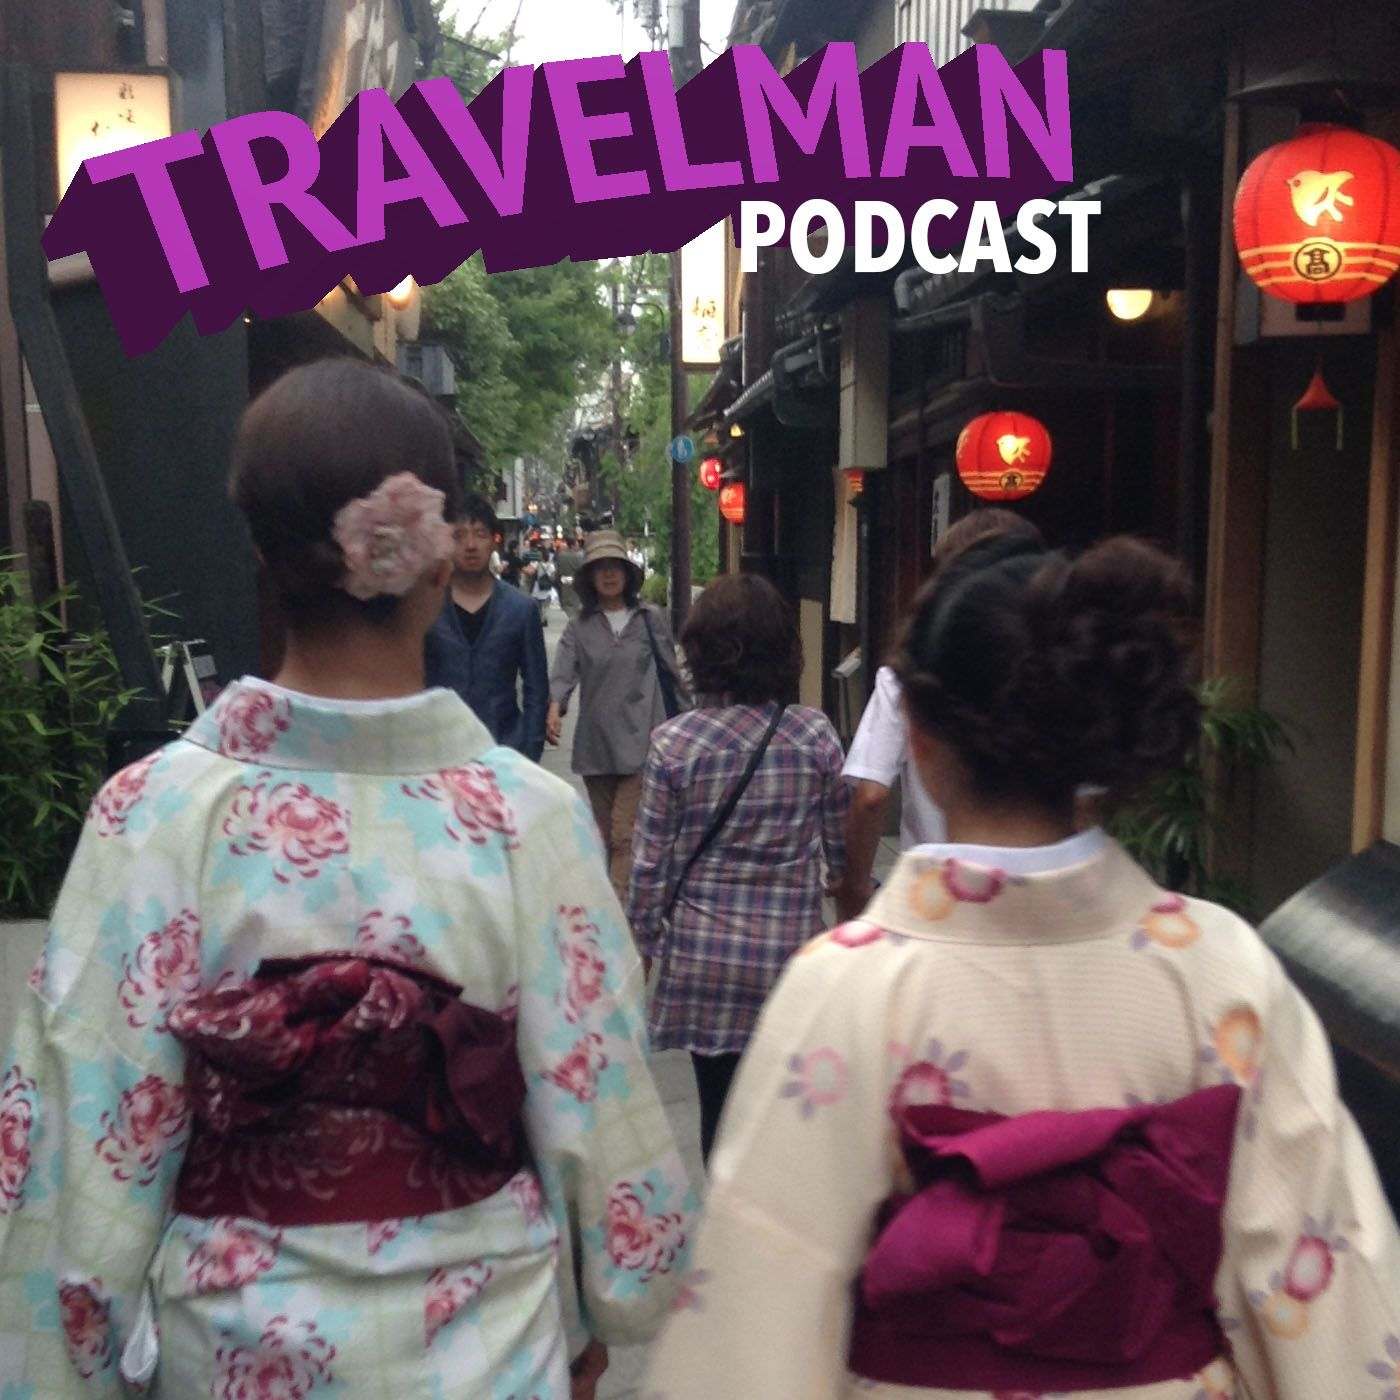 Travelman Podcast show art